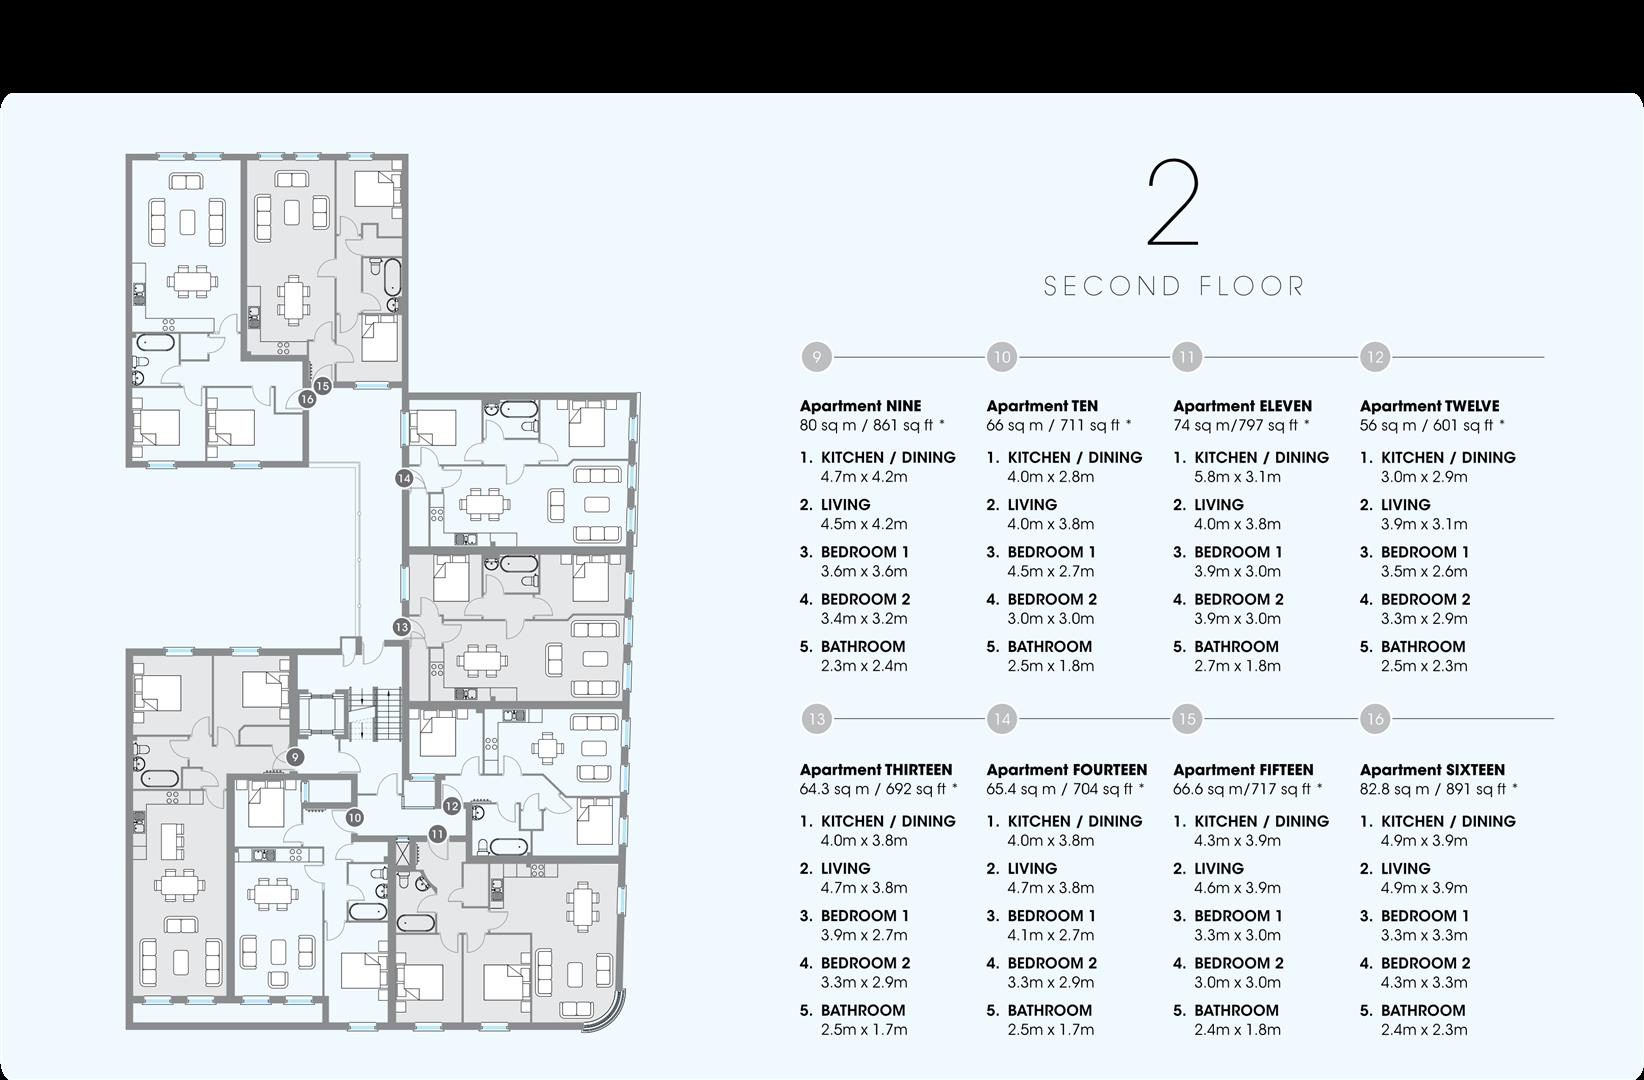 Coastal_Links_Final-floor-2-plan.png